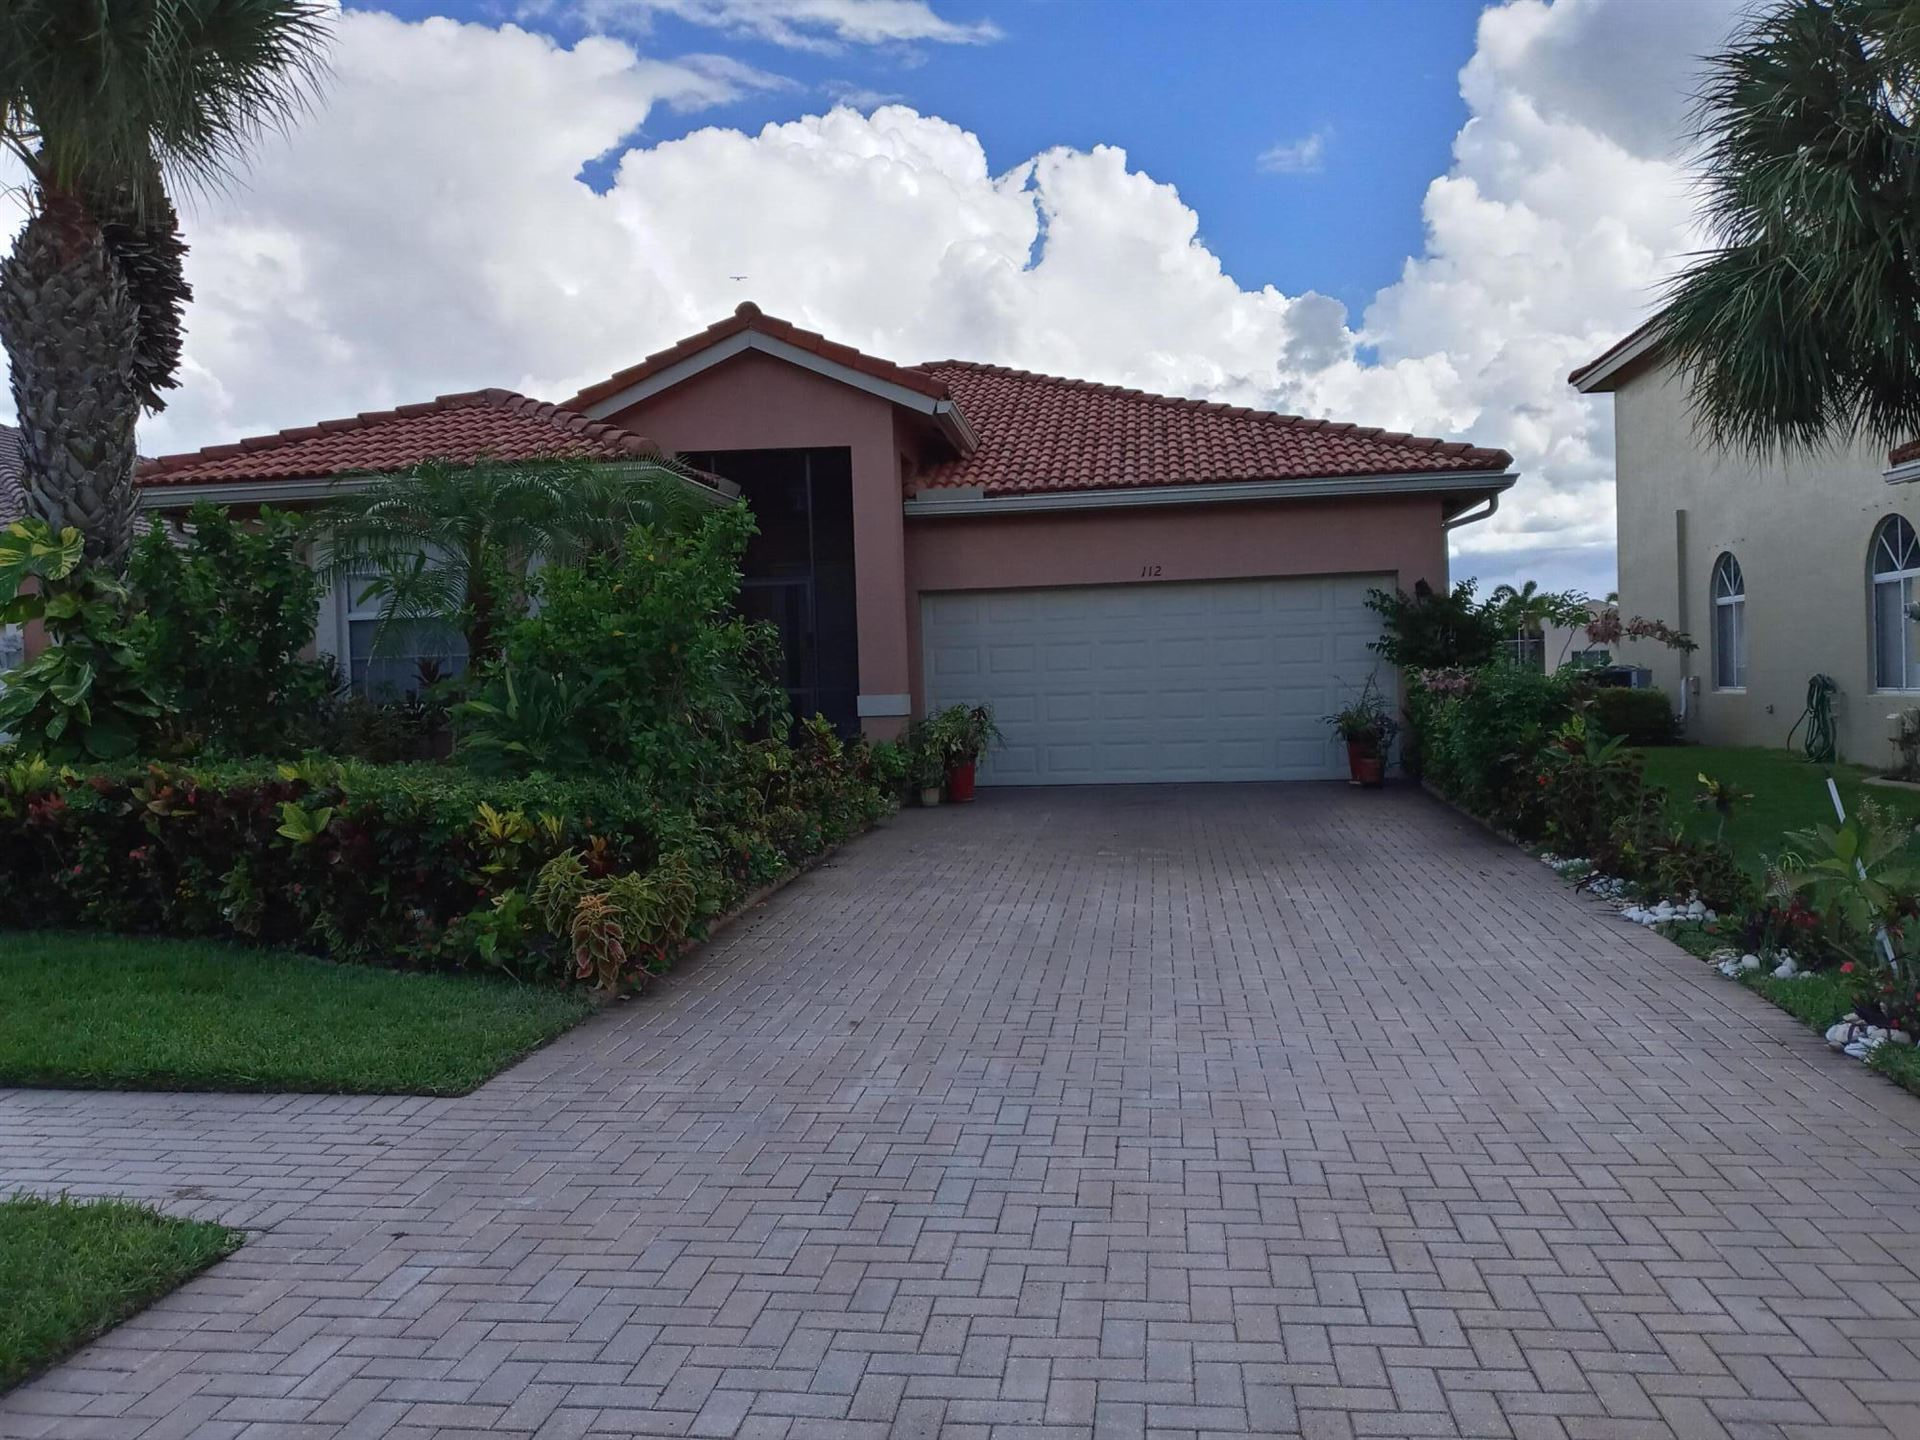 112 Catania Way, Royal Palm Beach, FL 33411 - MLS#: RX-10728632